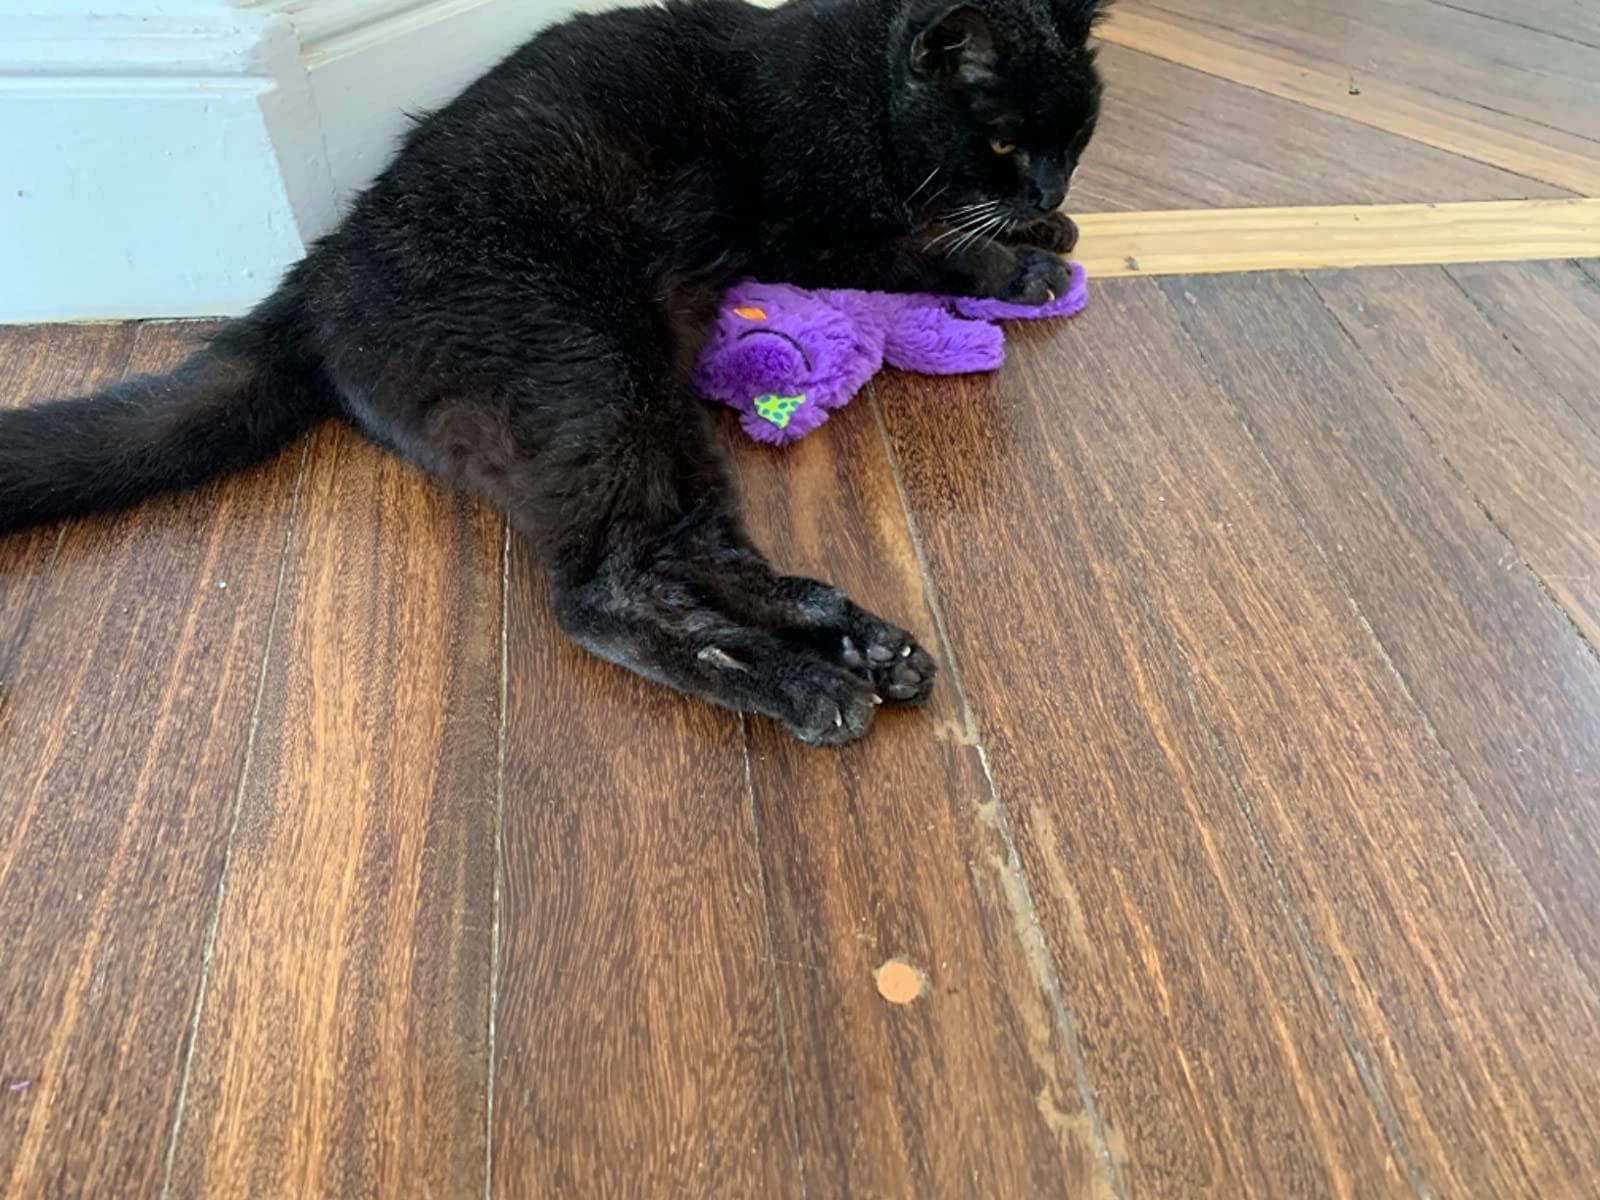 Review photo of cat enjoying the plush toy